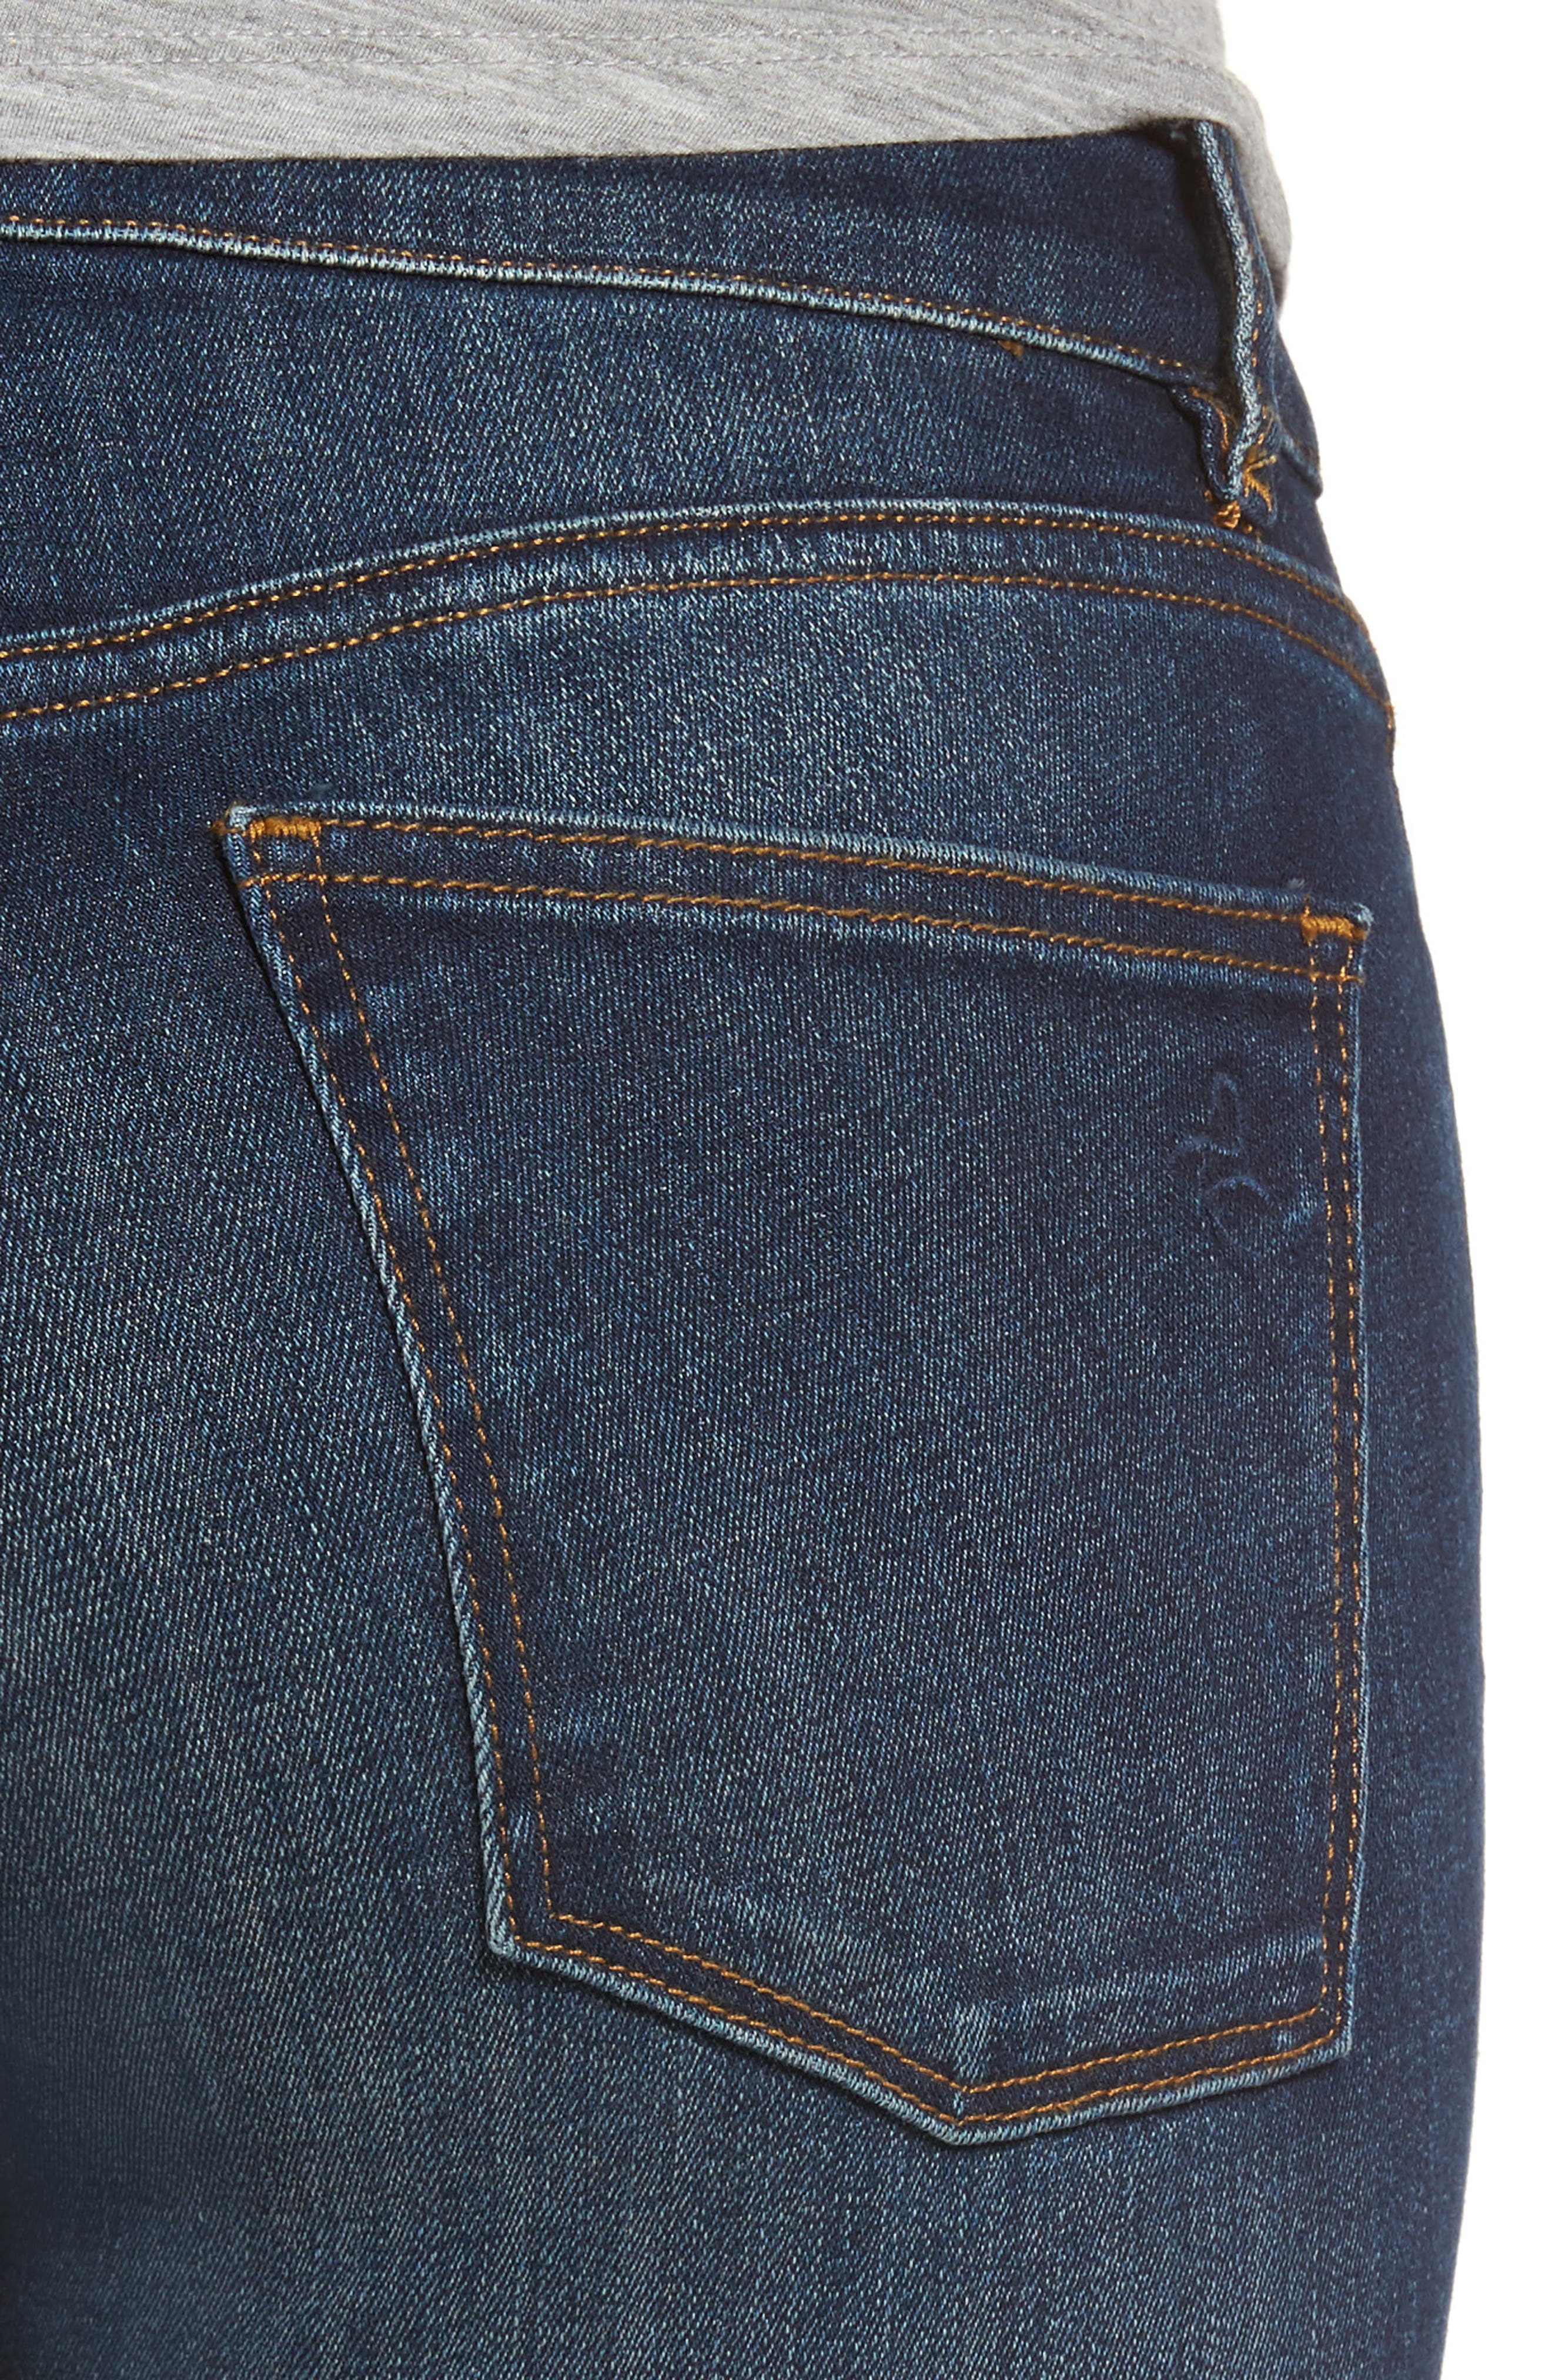 Emma Power Legging Skinny Jeans,                             Alternate thumbnail 4, color,                             Sulton